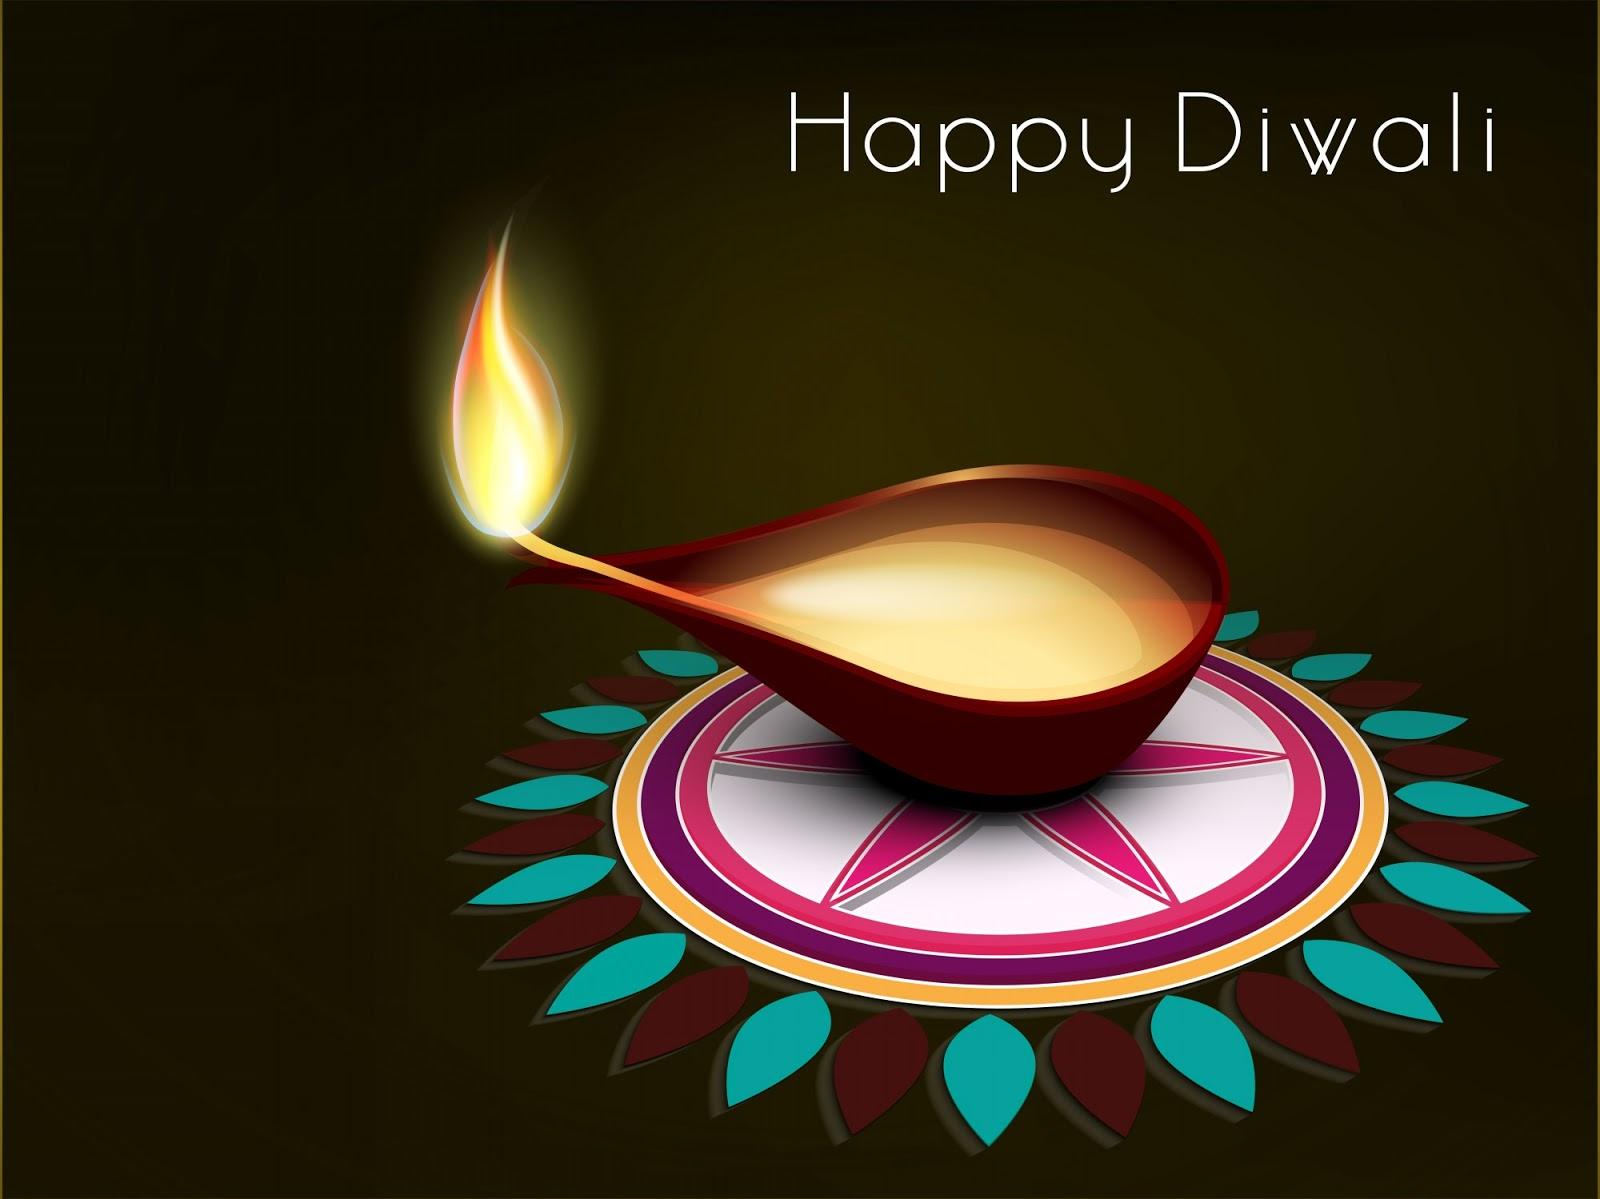 Happy Diwali Images Galleries Free Download